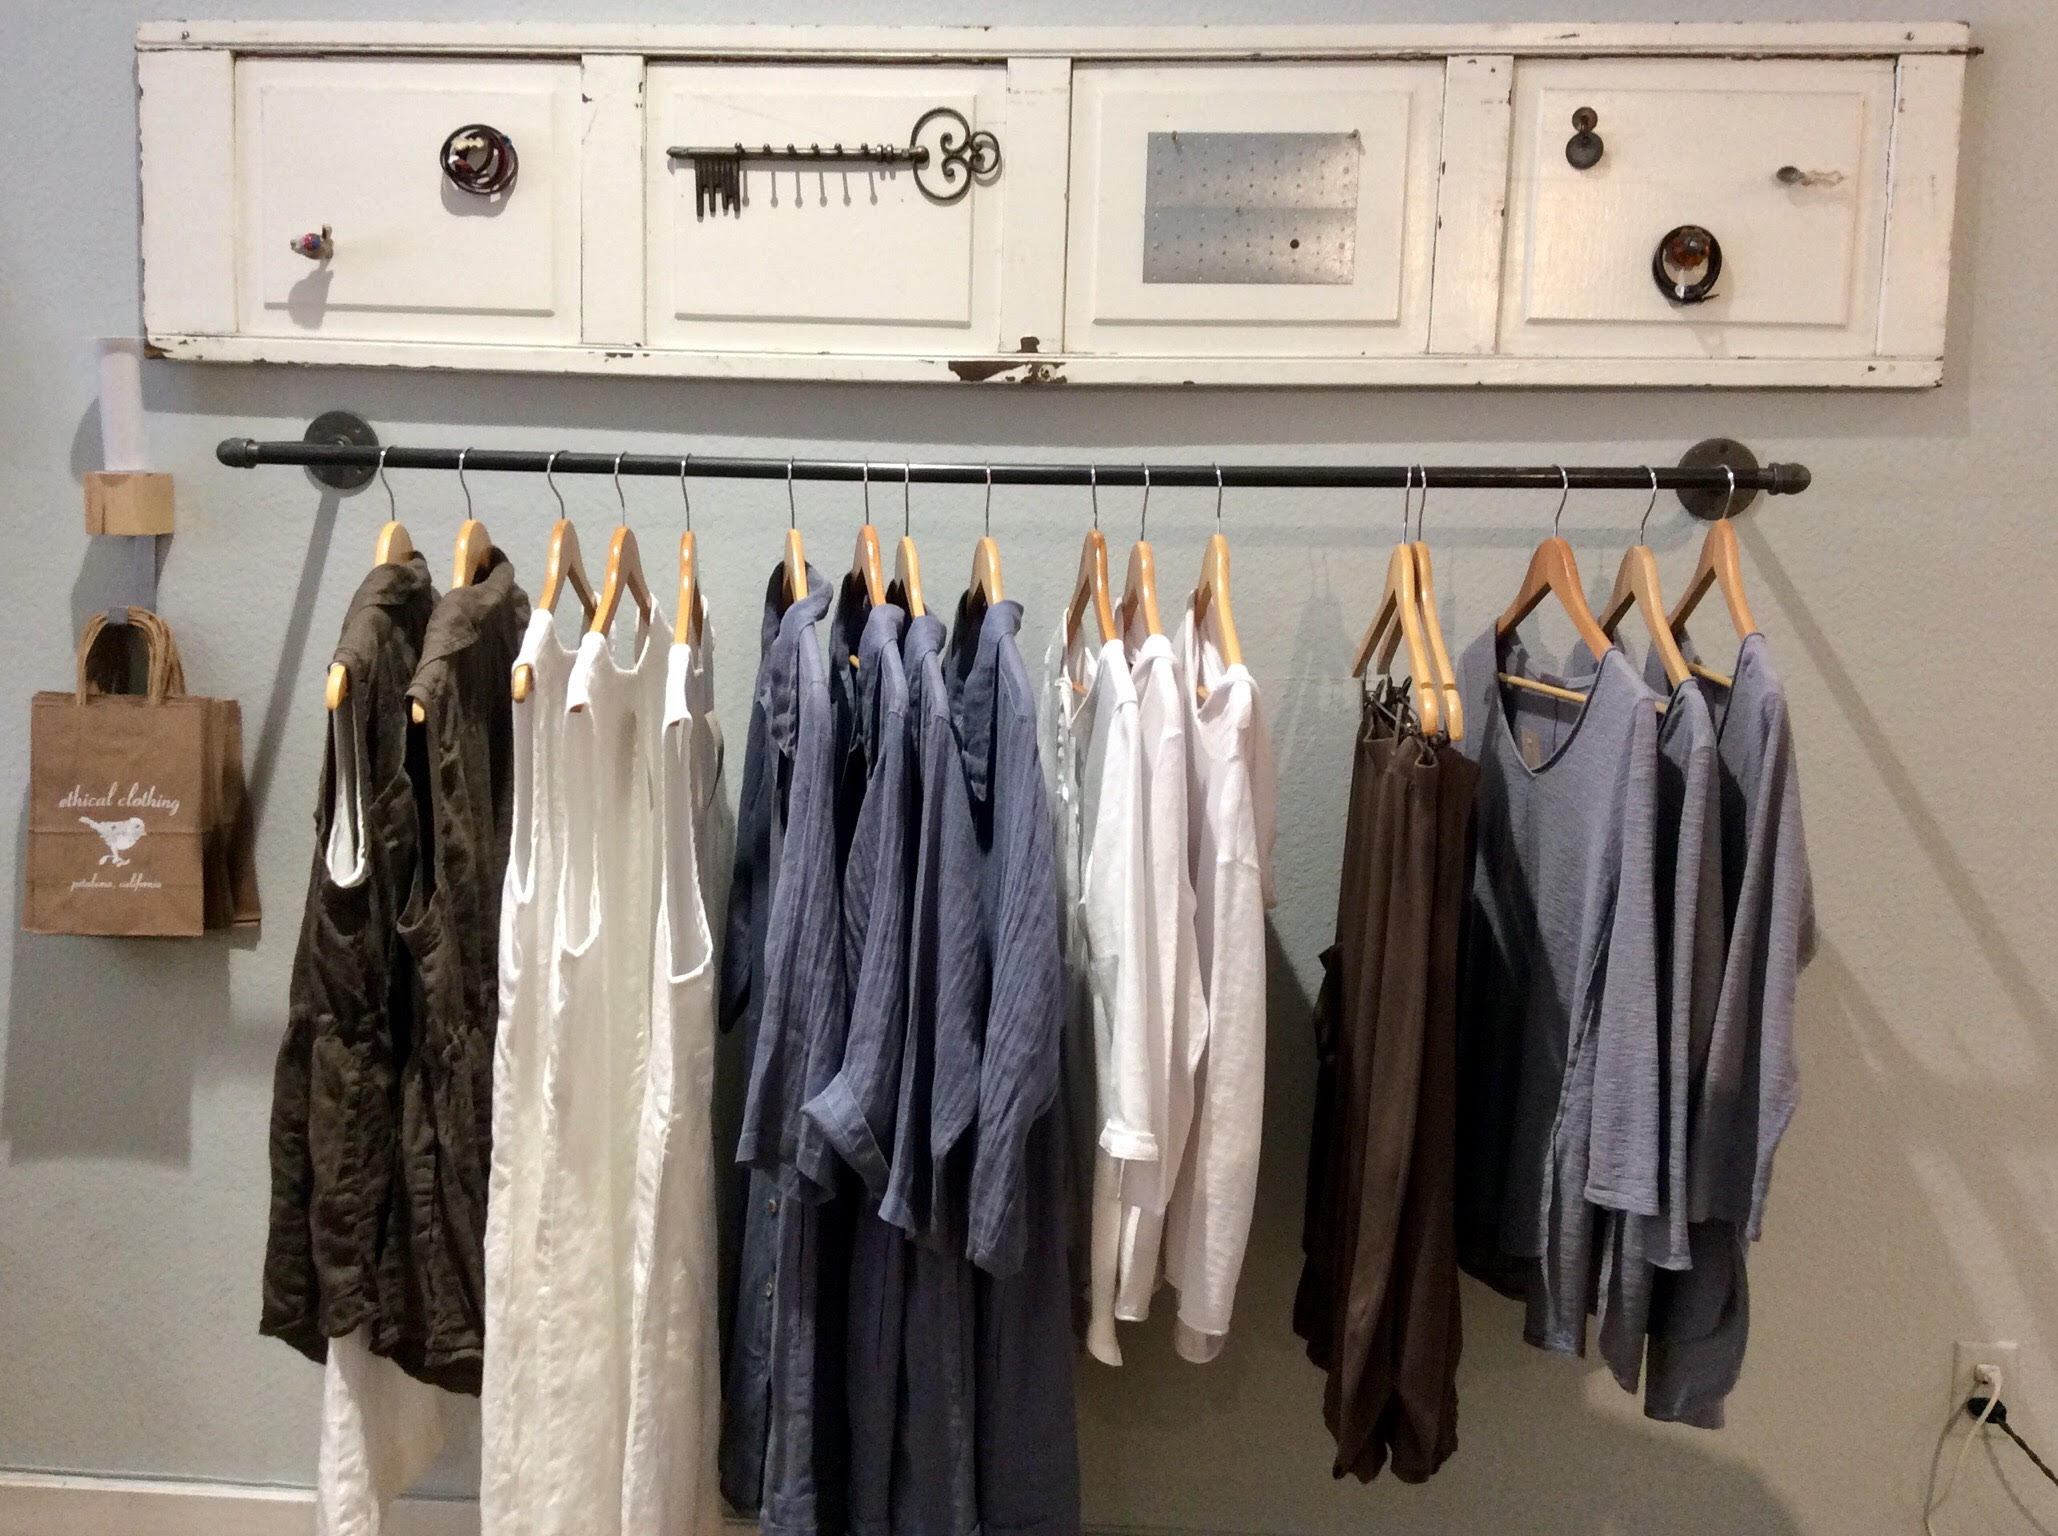 Ethical Clothing in Petaluma, California